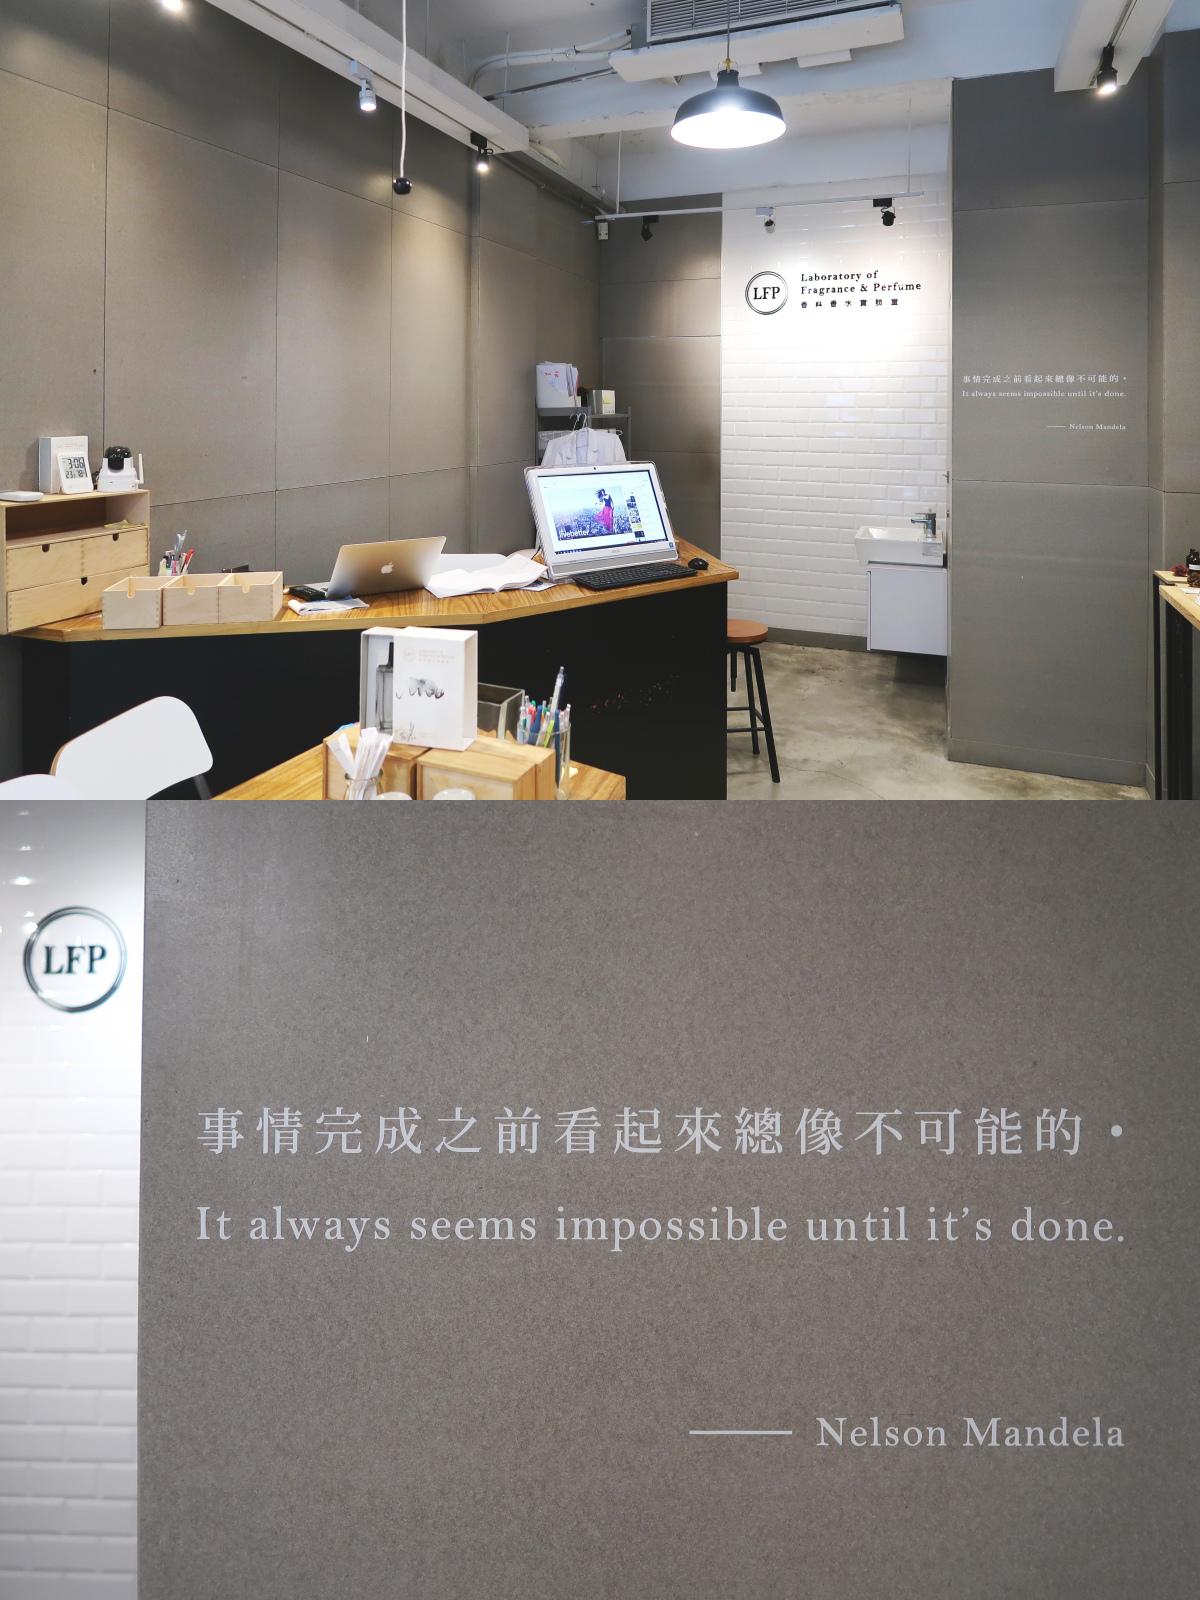 IMG_2-2_LFP香料香水實驗室 心得.jpg